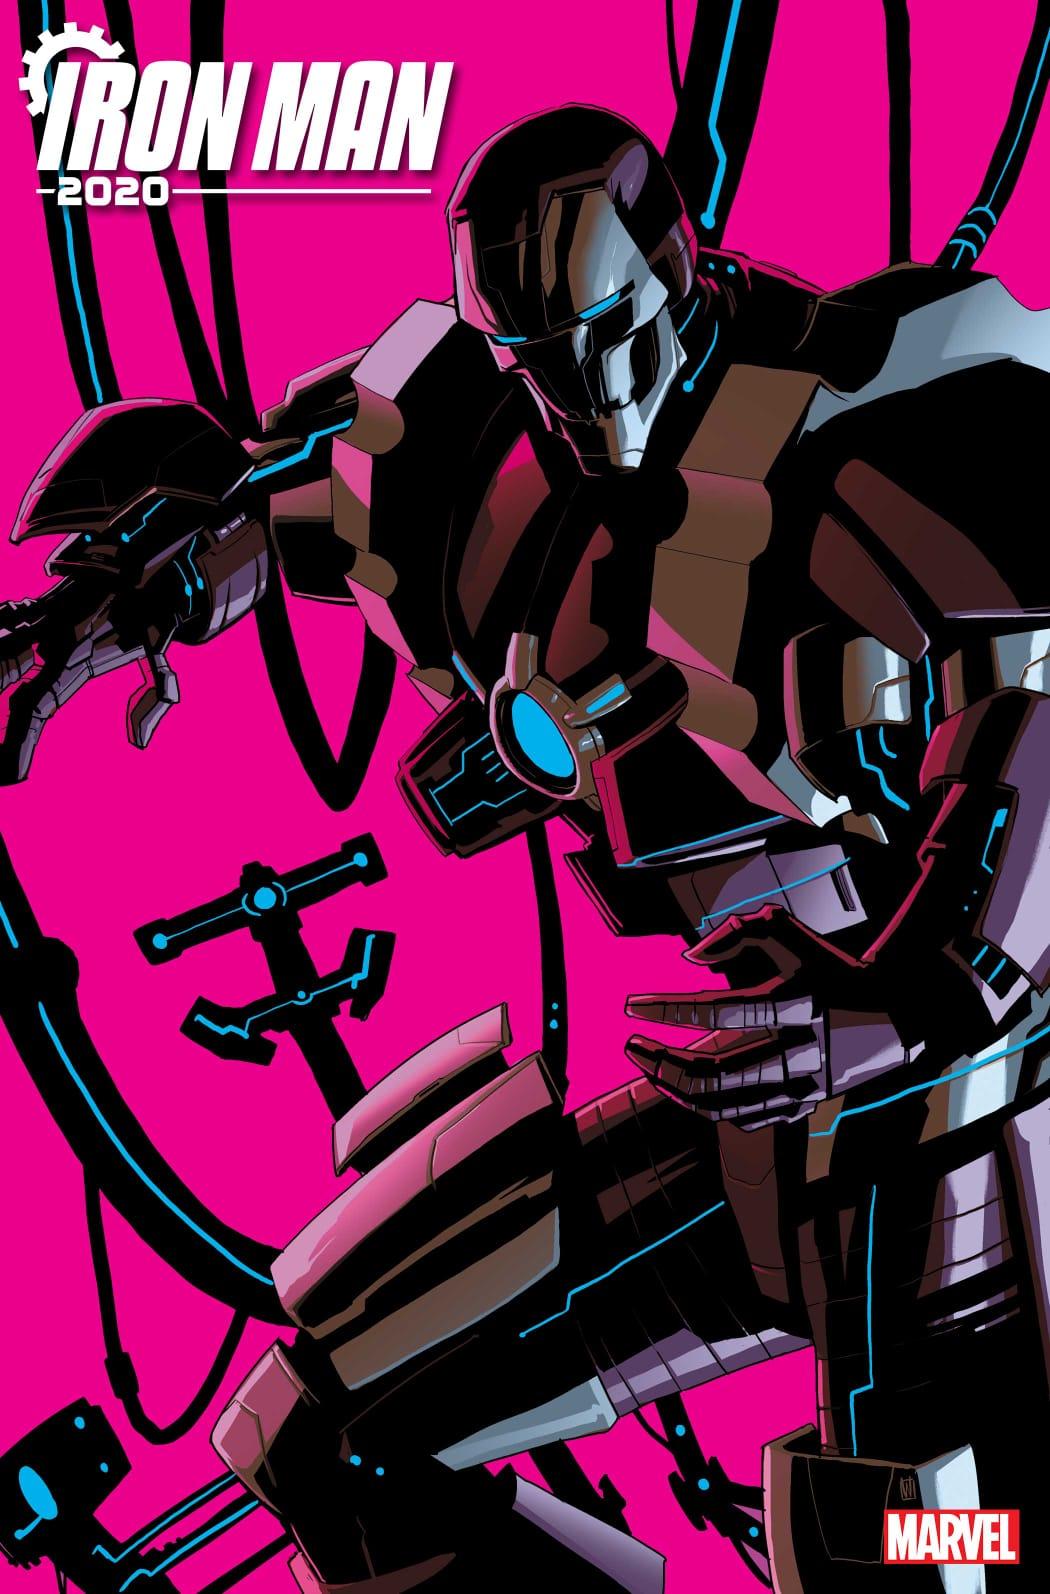 Iron Man 2020 (2020) #1 portada